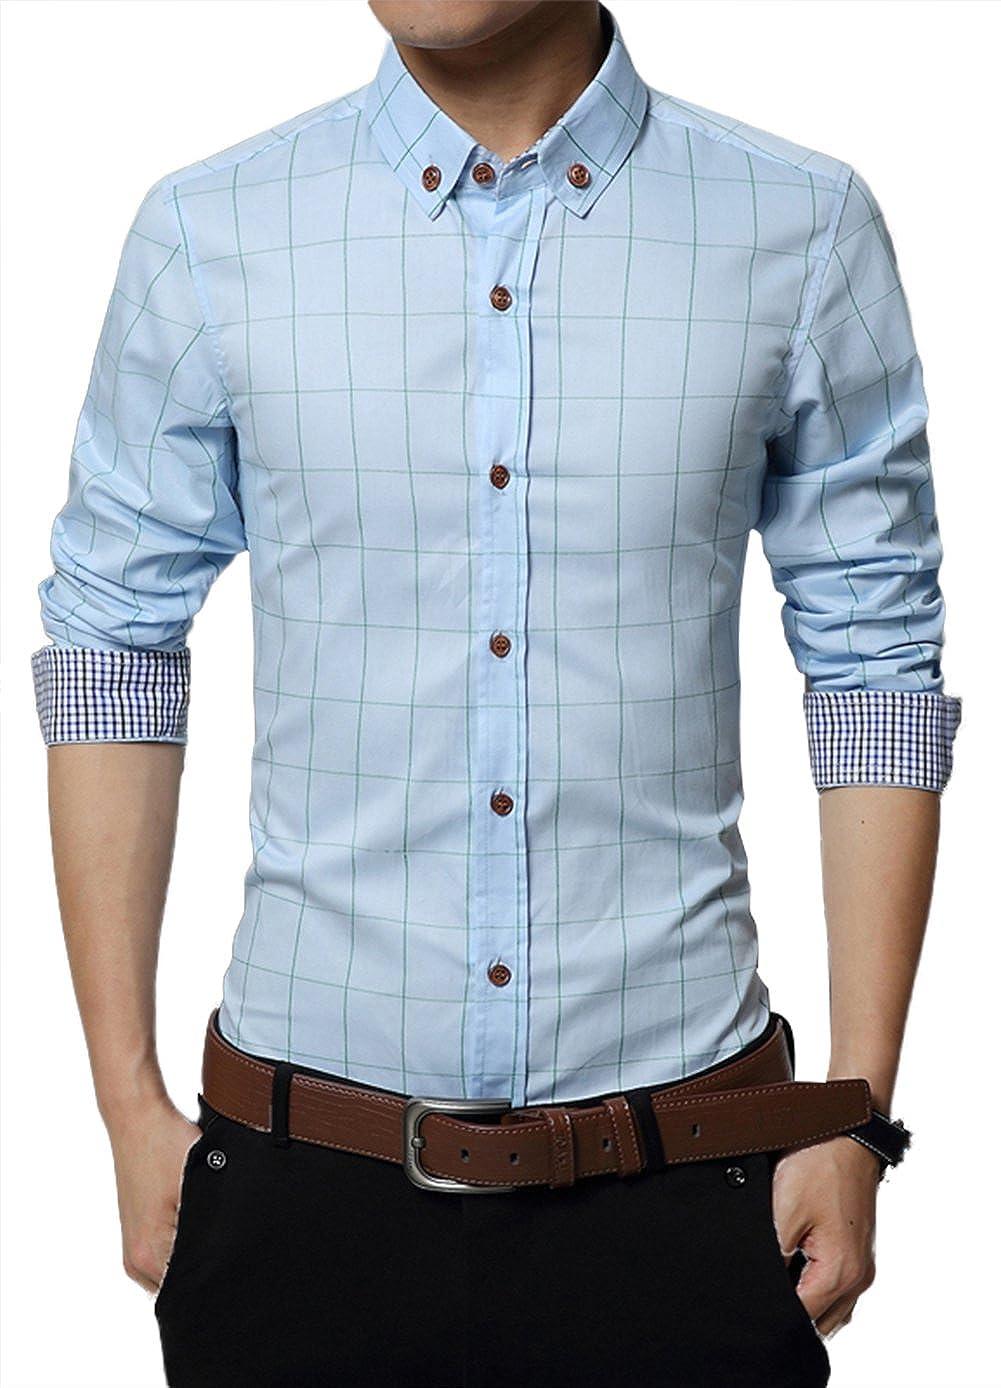 Musen Men Causal Cotton Slim Fit Plaid Button Down Long Sleeve Dress Shirt JuChao